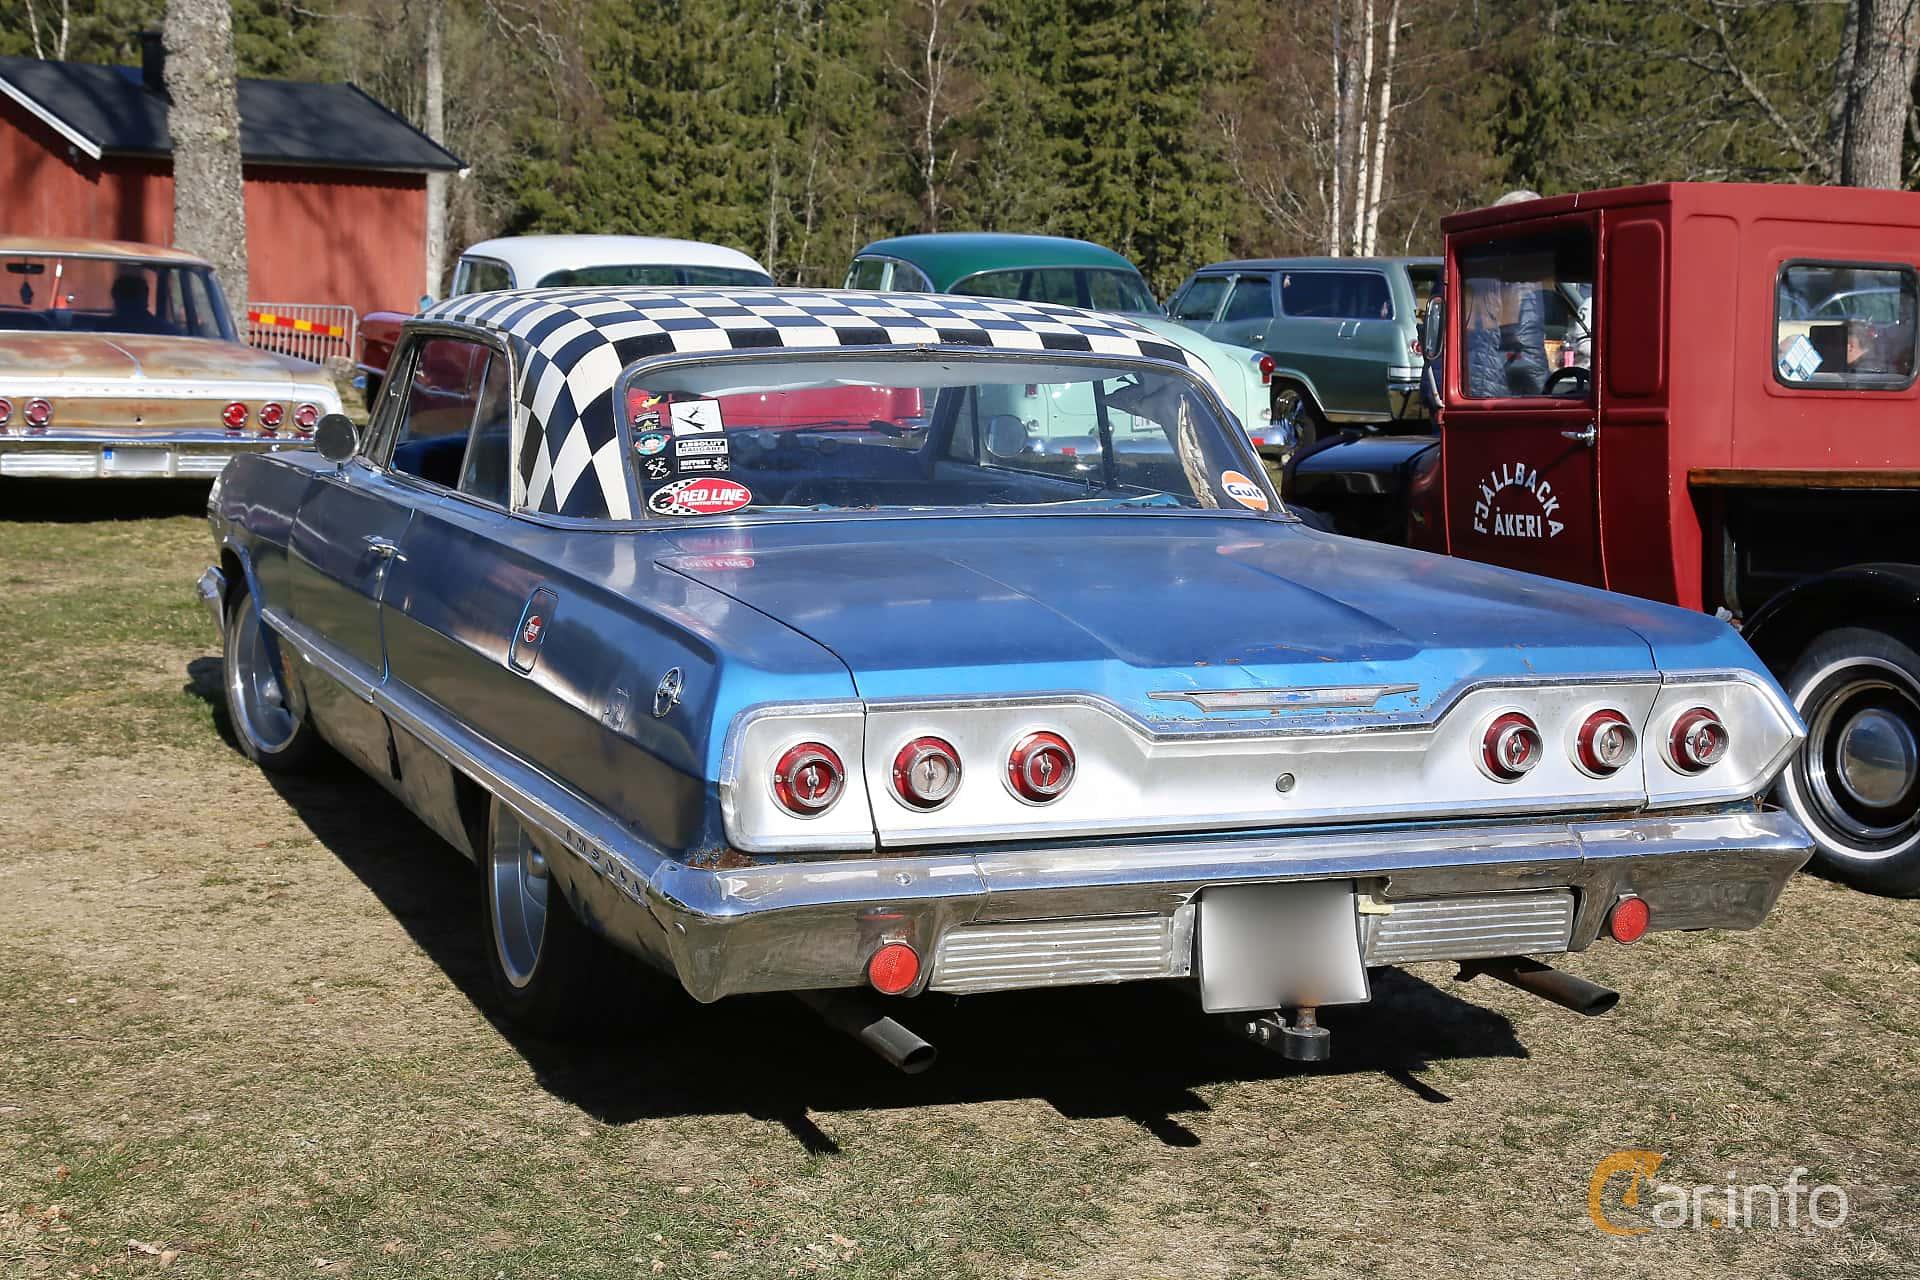 Chevrolet Impala Sport Coupé 4.6 V8 Powerglide, 198hp, 1963 at Uddevalla Veteranbilsmarknad Backamo, Ljungsk 2019